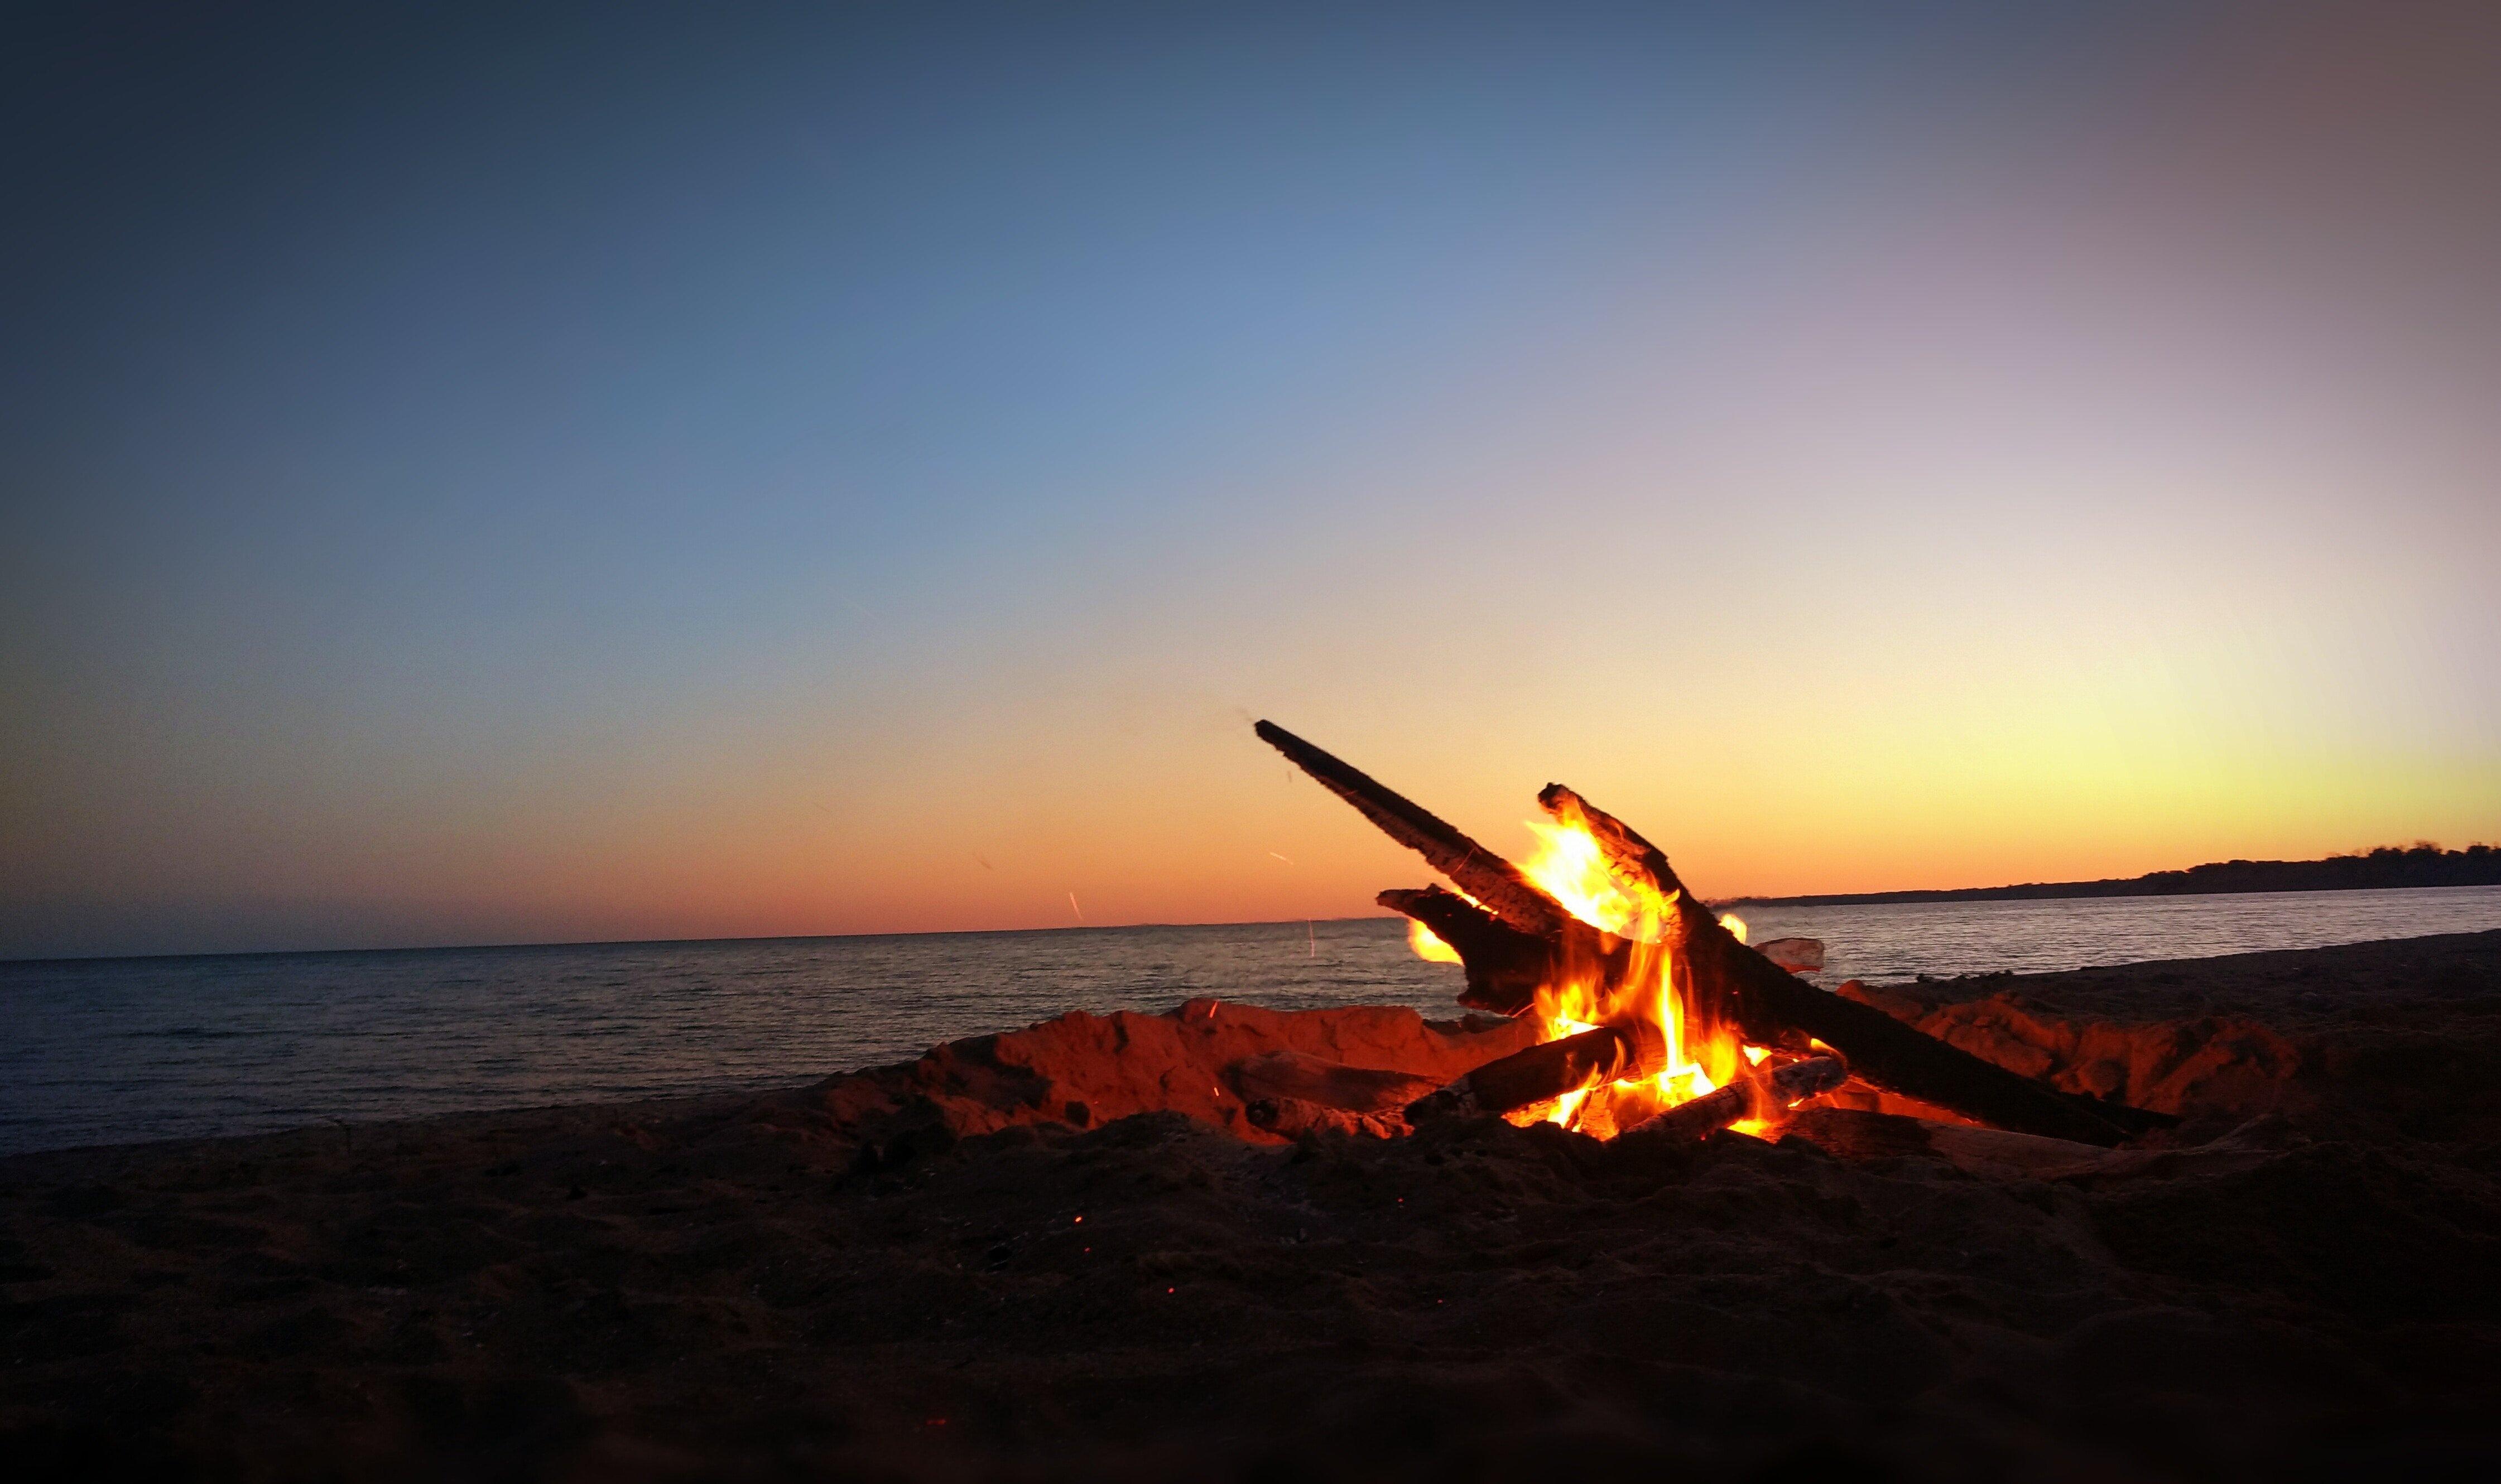 Fall Bucket list & Autumn Photography Challenge October Fire and Winter beach